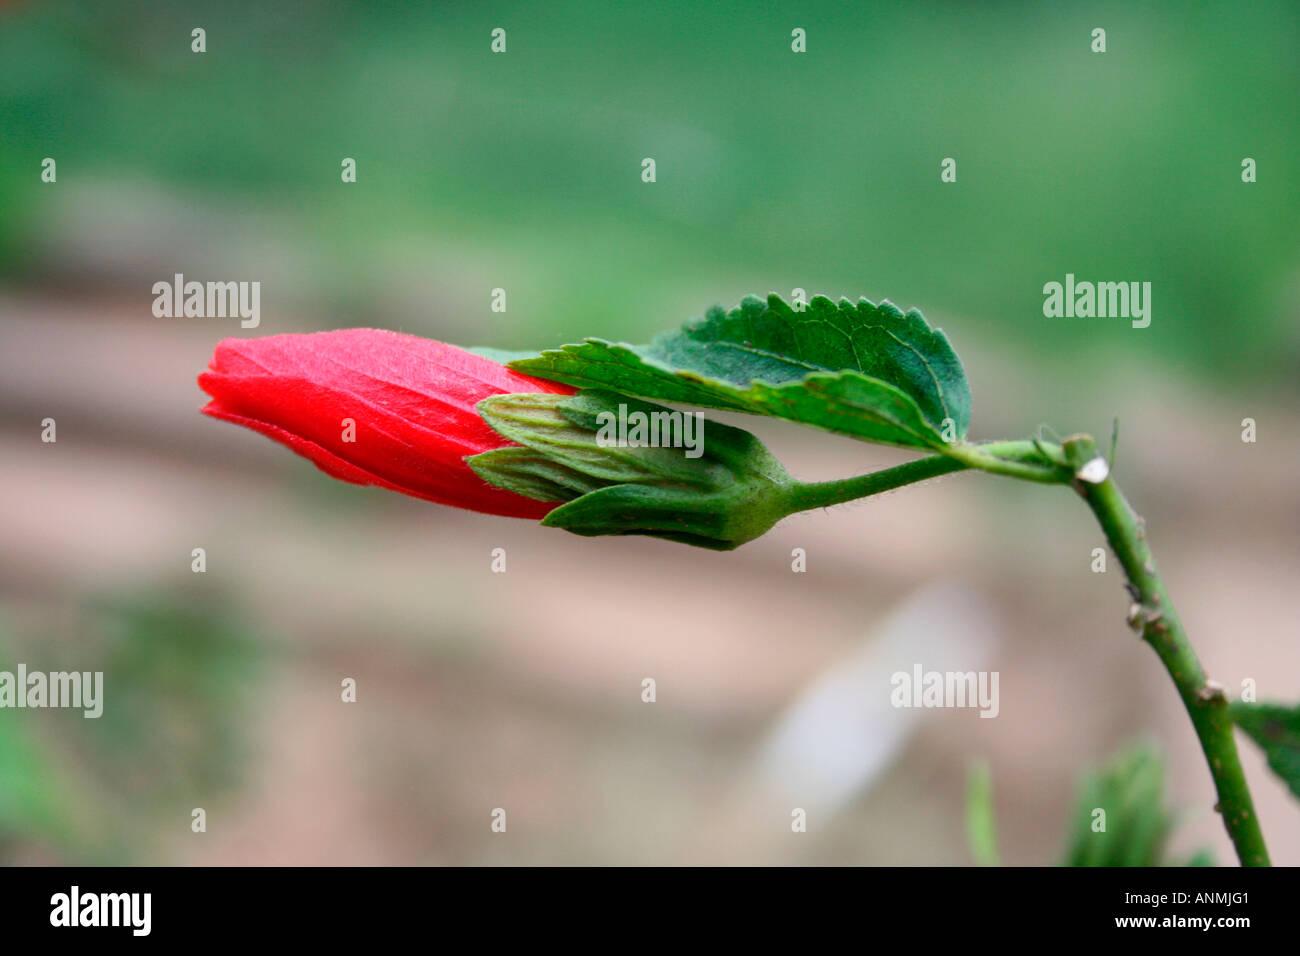 Close up of a red hibiscus bud in munnar kerala stock photo close up of a red hibiscus bud in munnar kerala izmirmasajfo